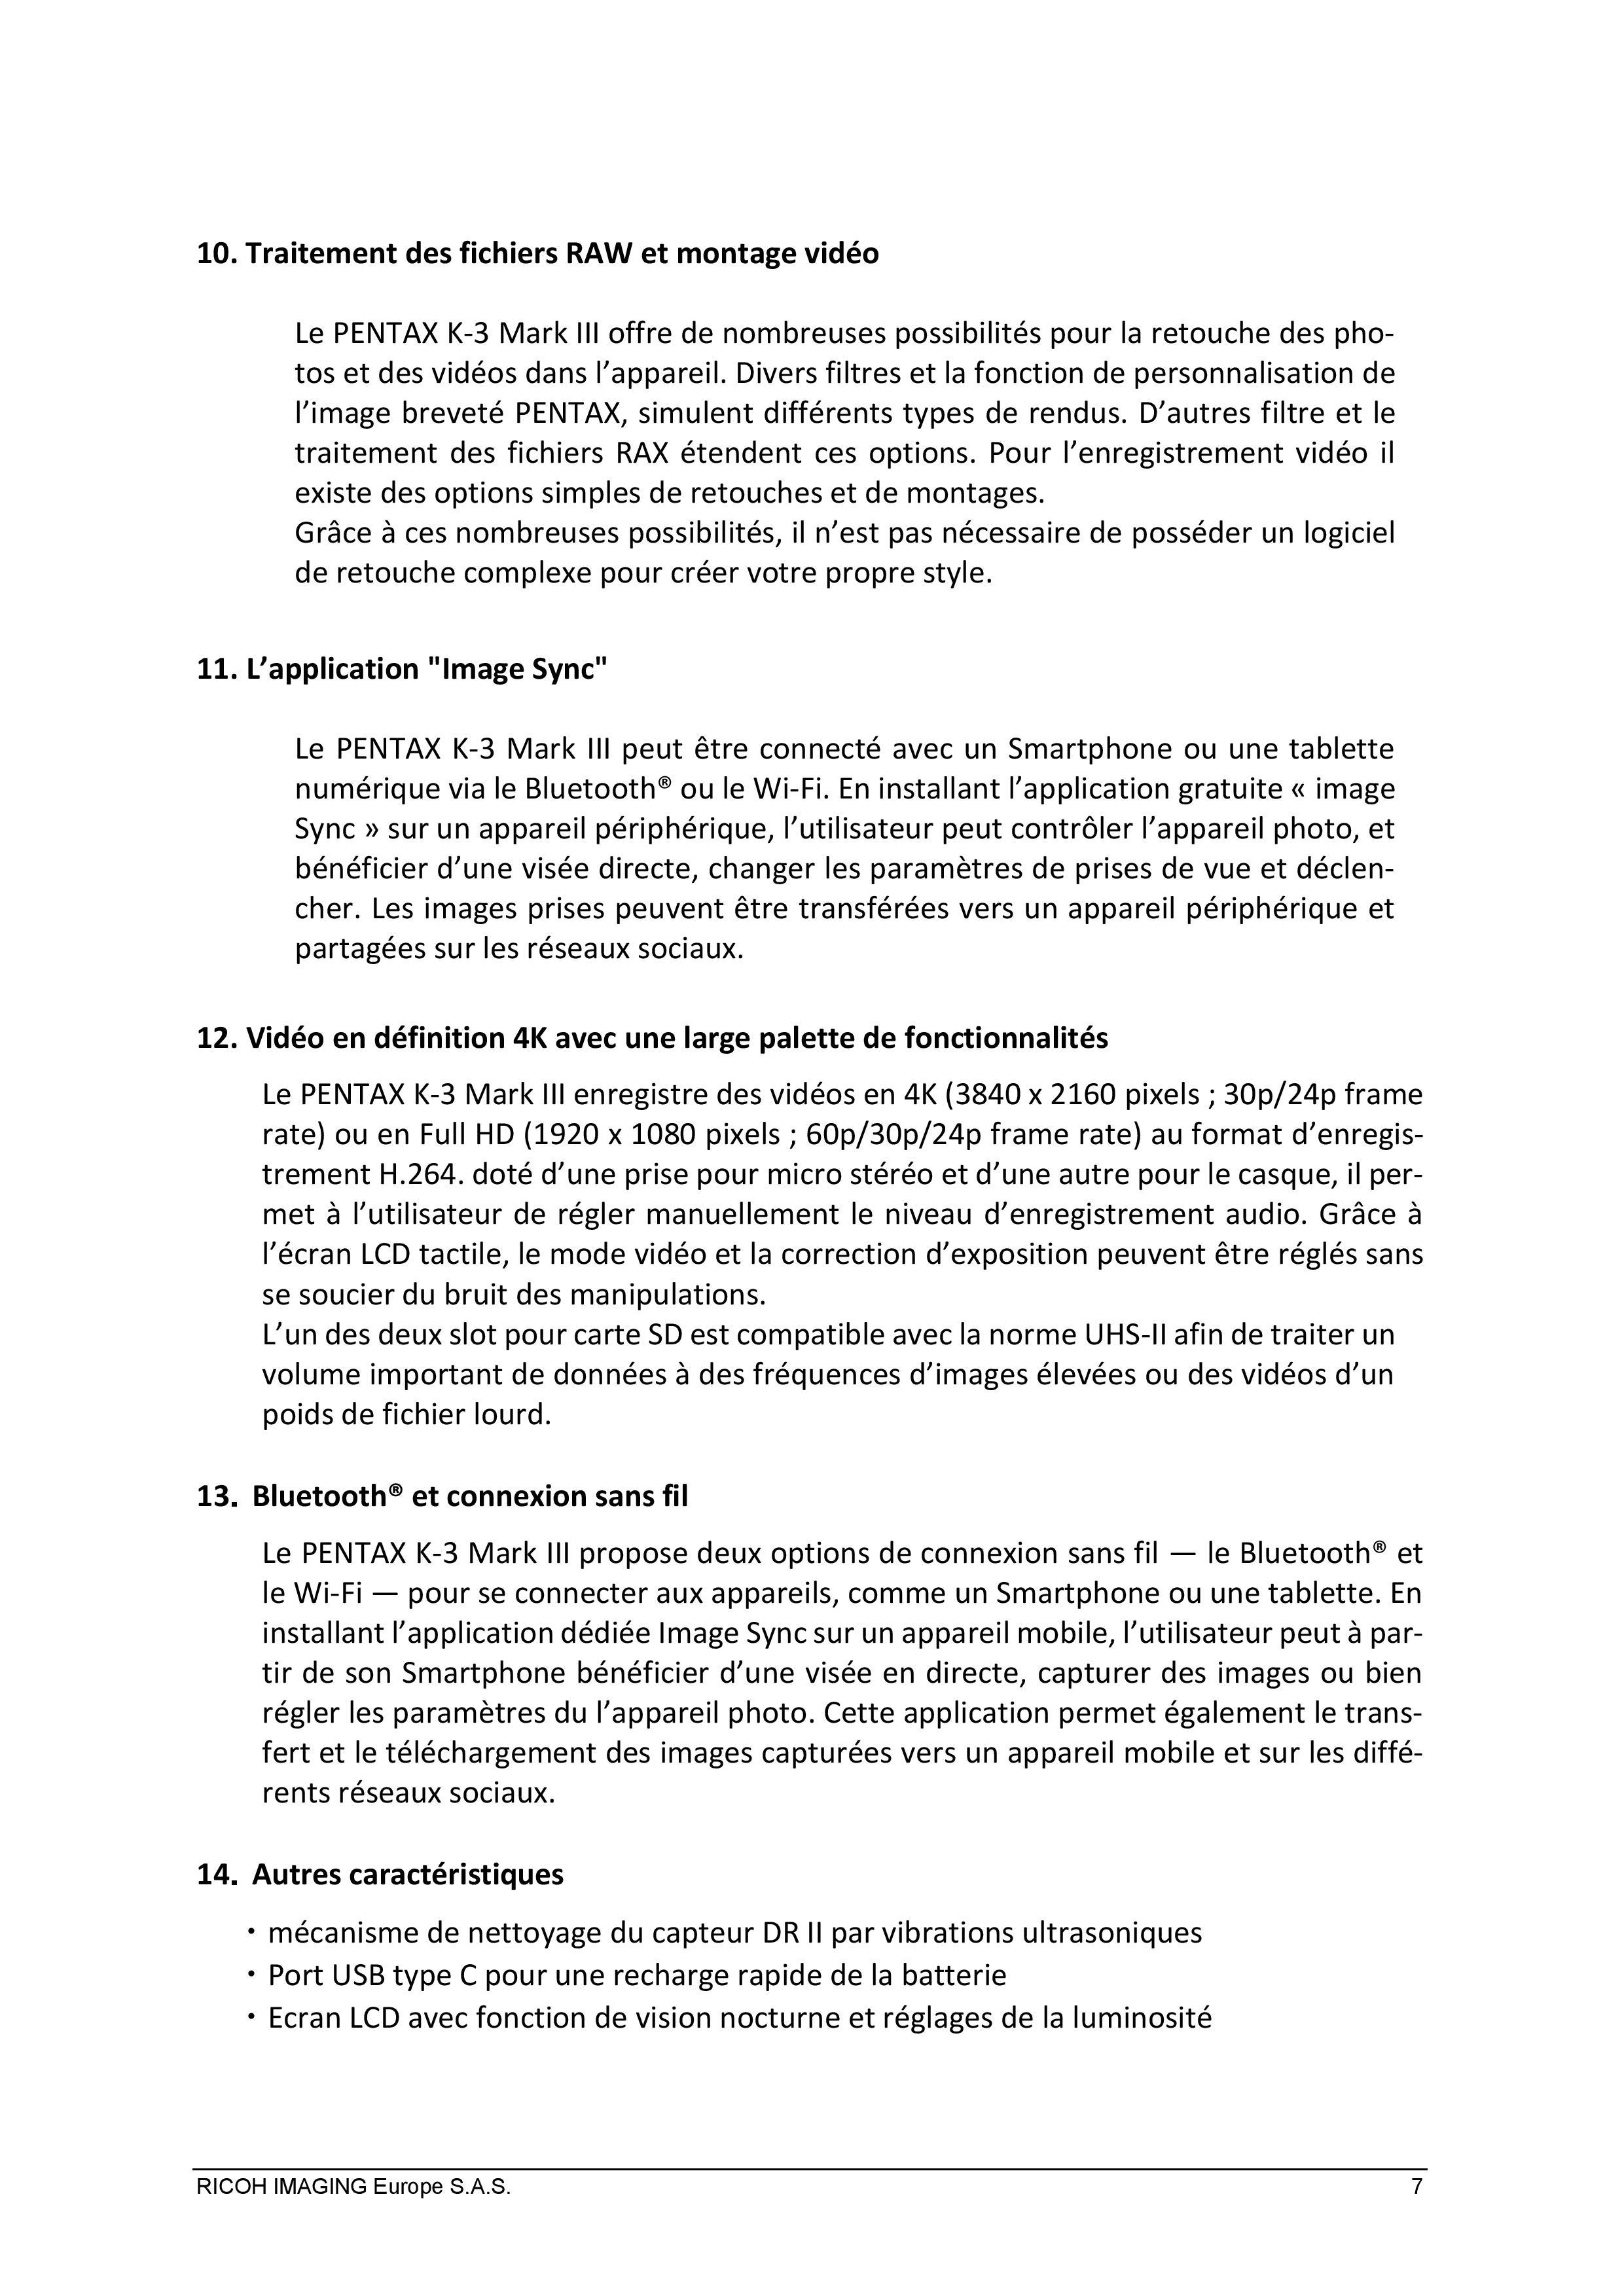 PENTAX RICOH IMAGING - Communiqué de presse du K3 Mark III 21033103153123142217344193